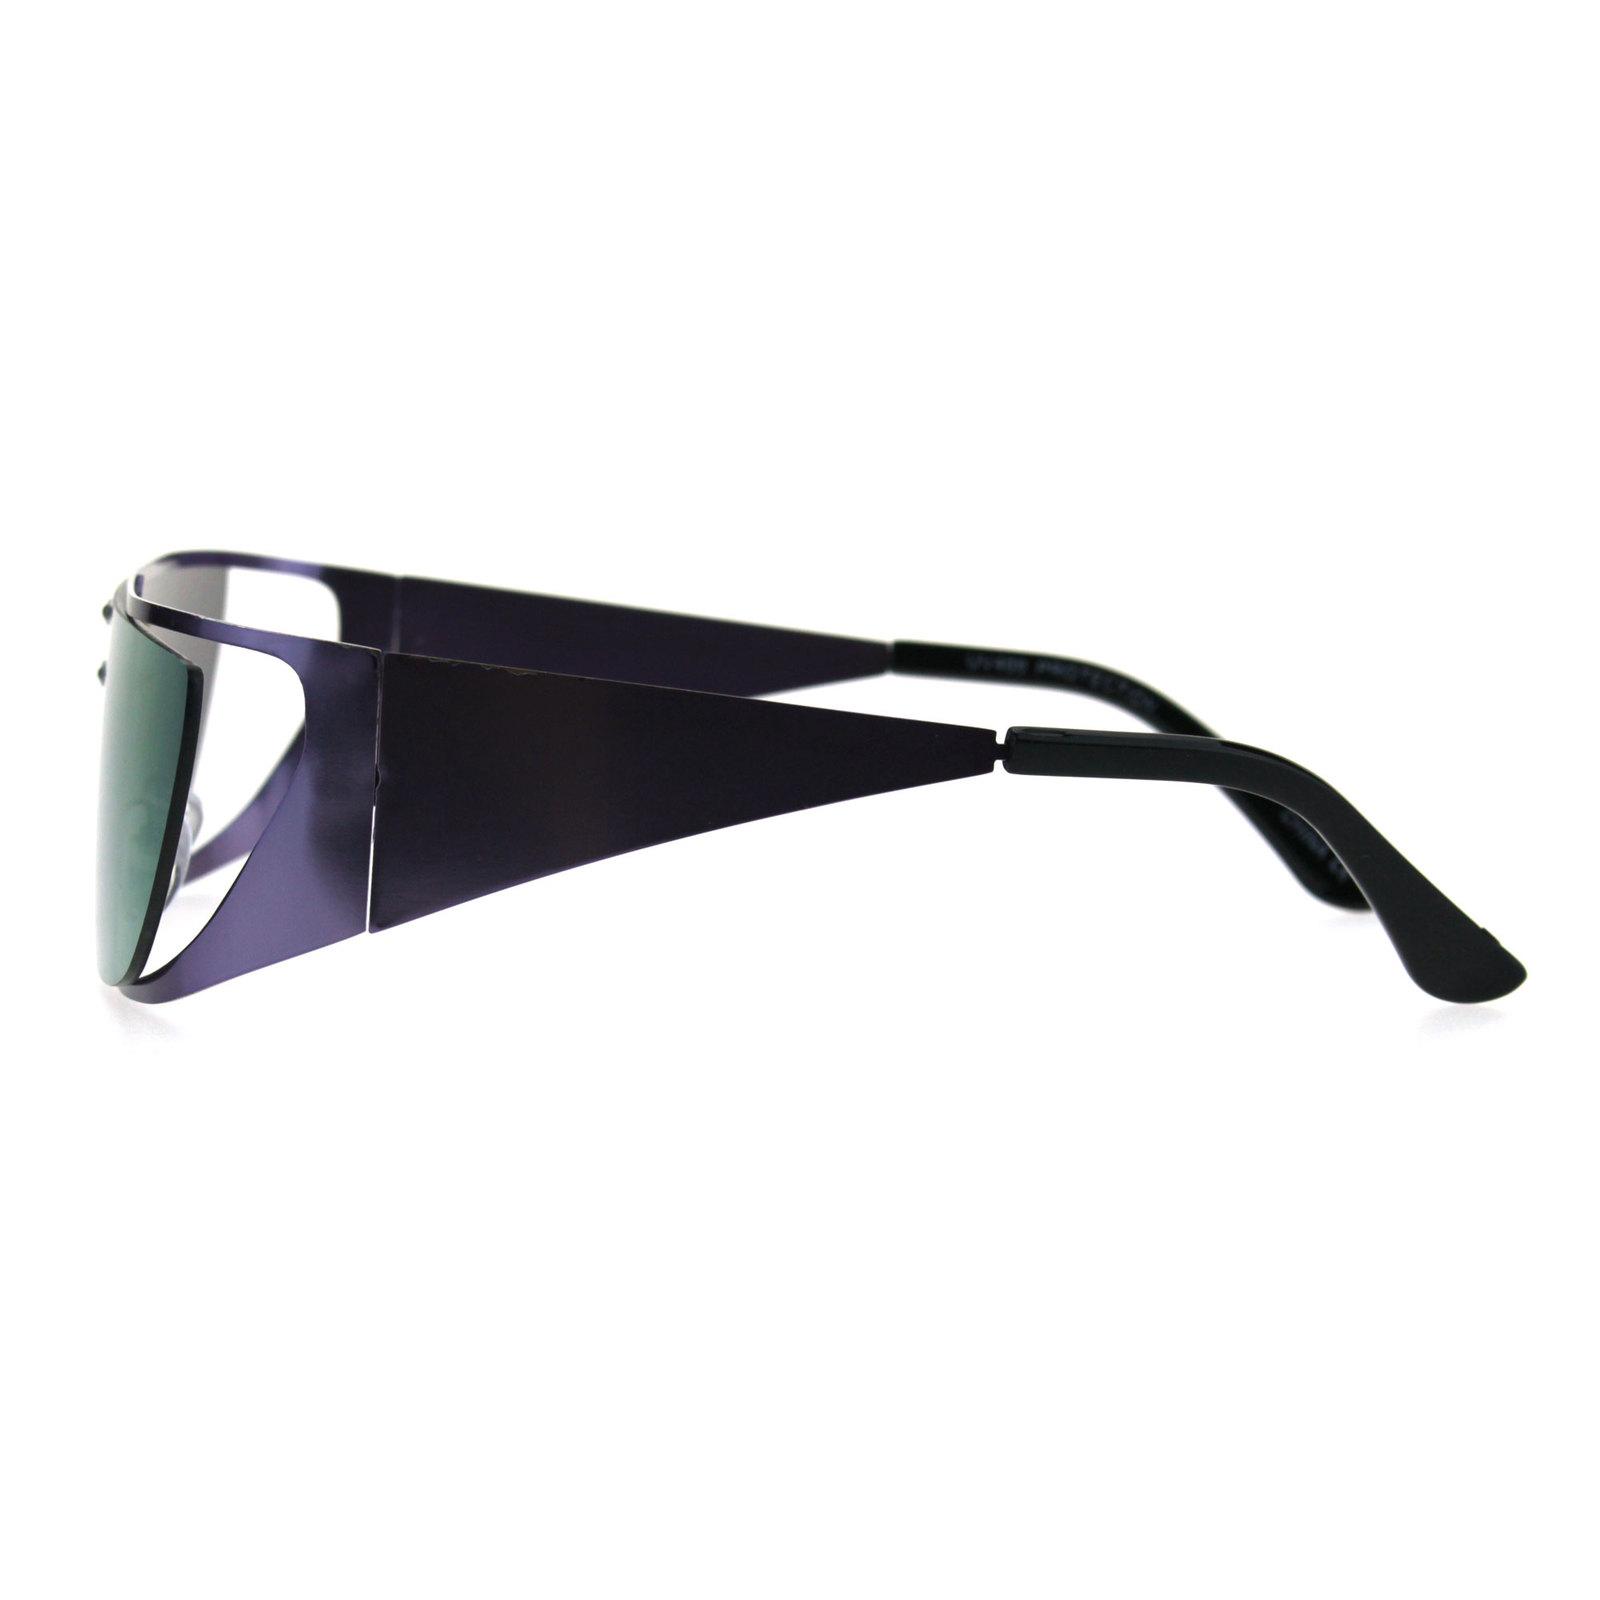 Shield Gothic Robotic Funky Disco Metal Rim Color Mirror Sunglasses